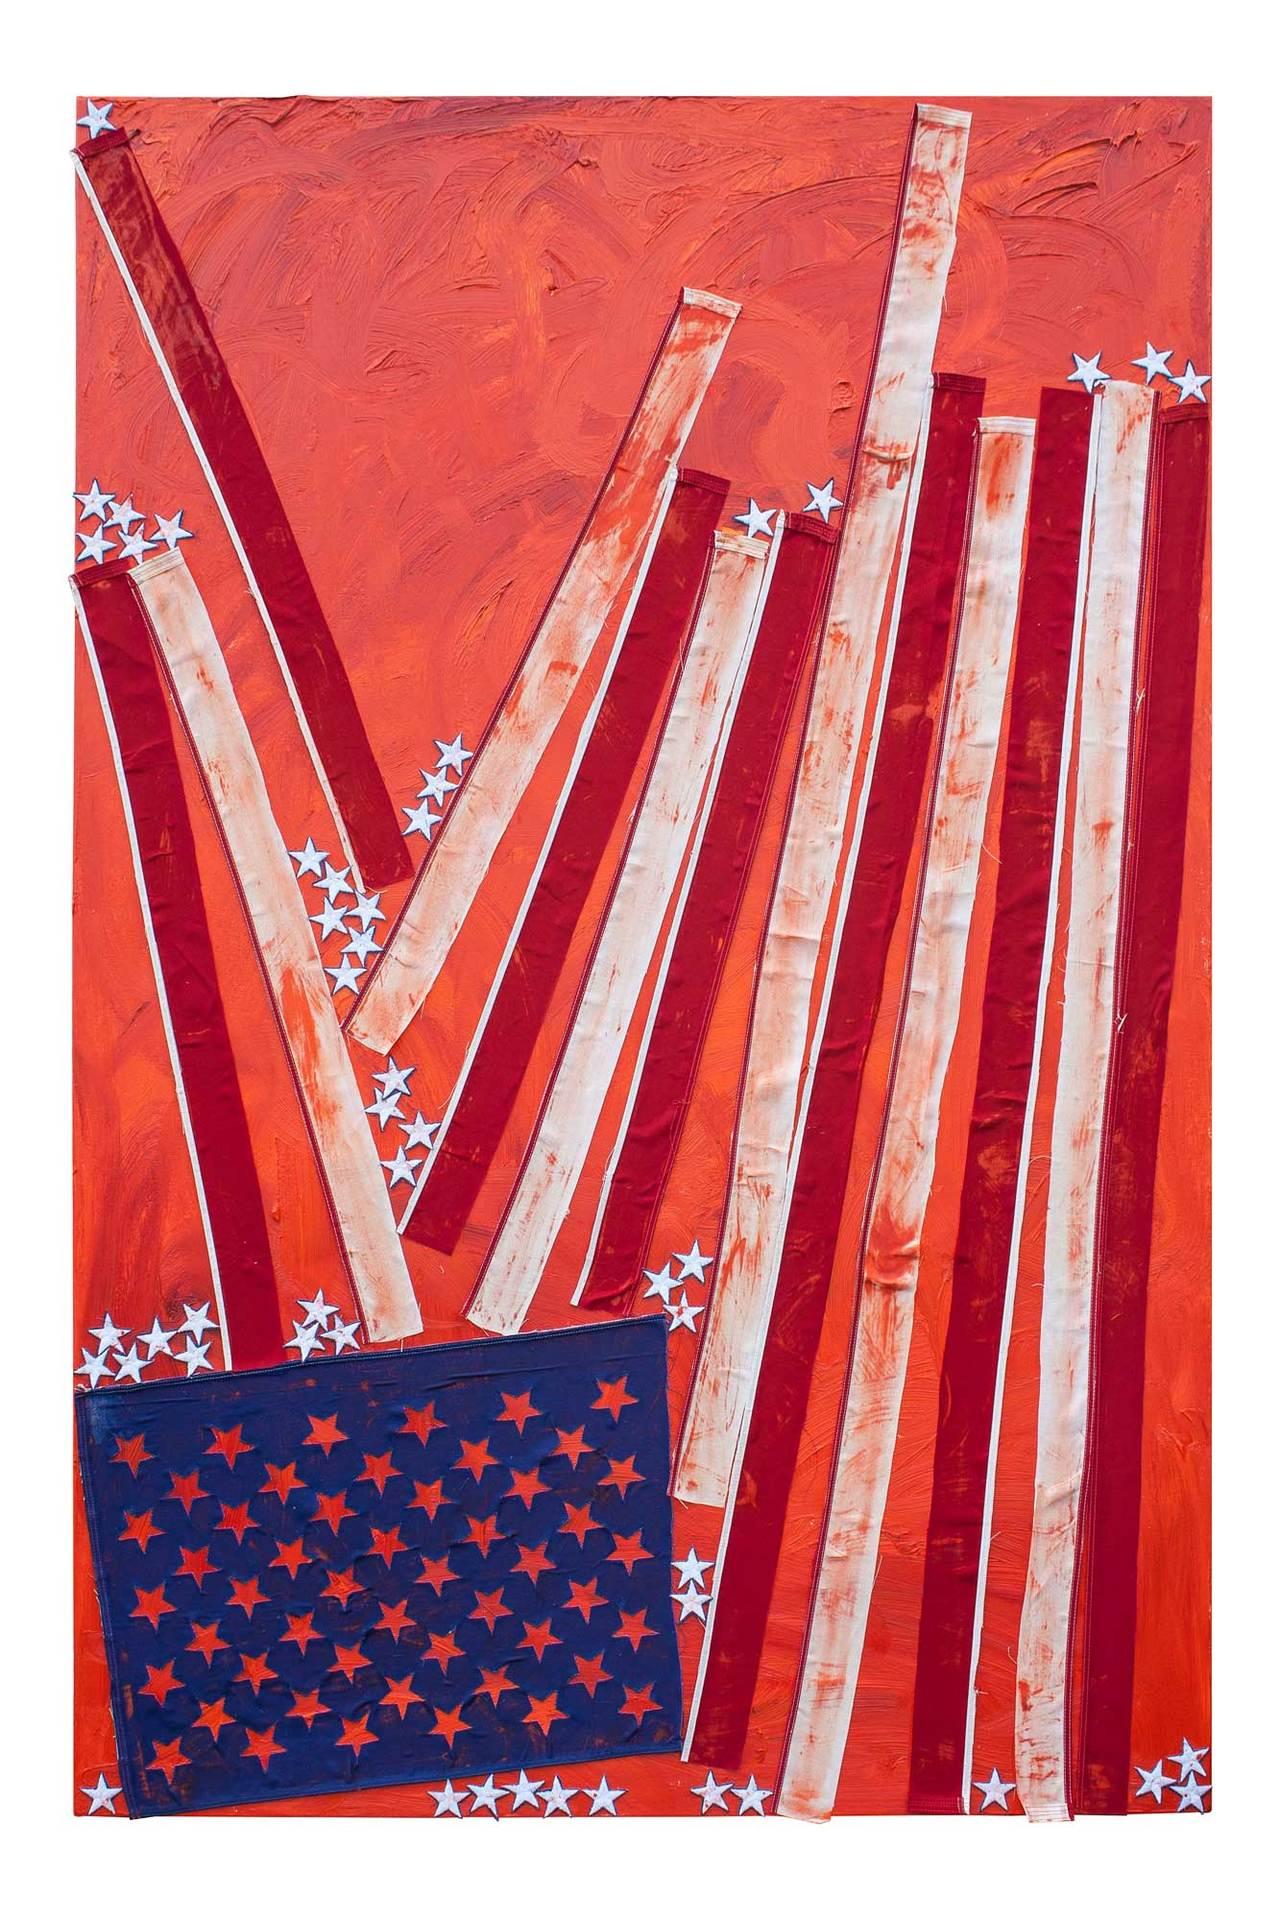 Union v. Liberty, Steve Hartman